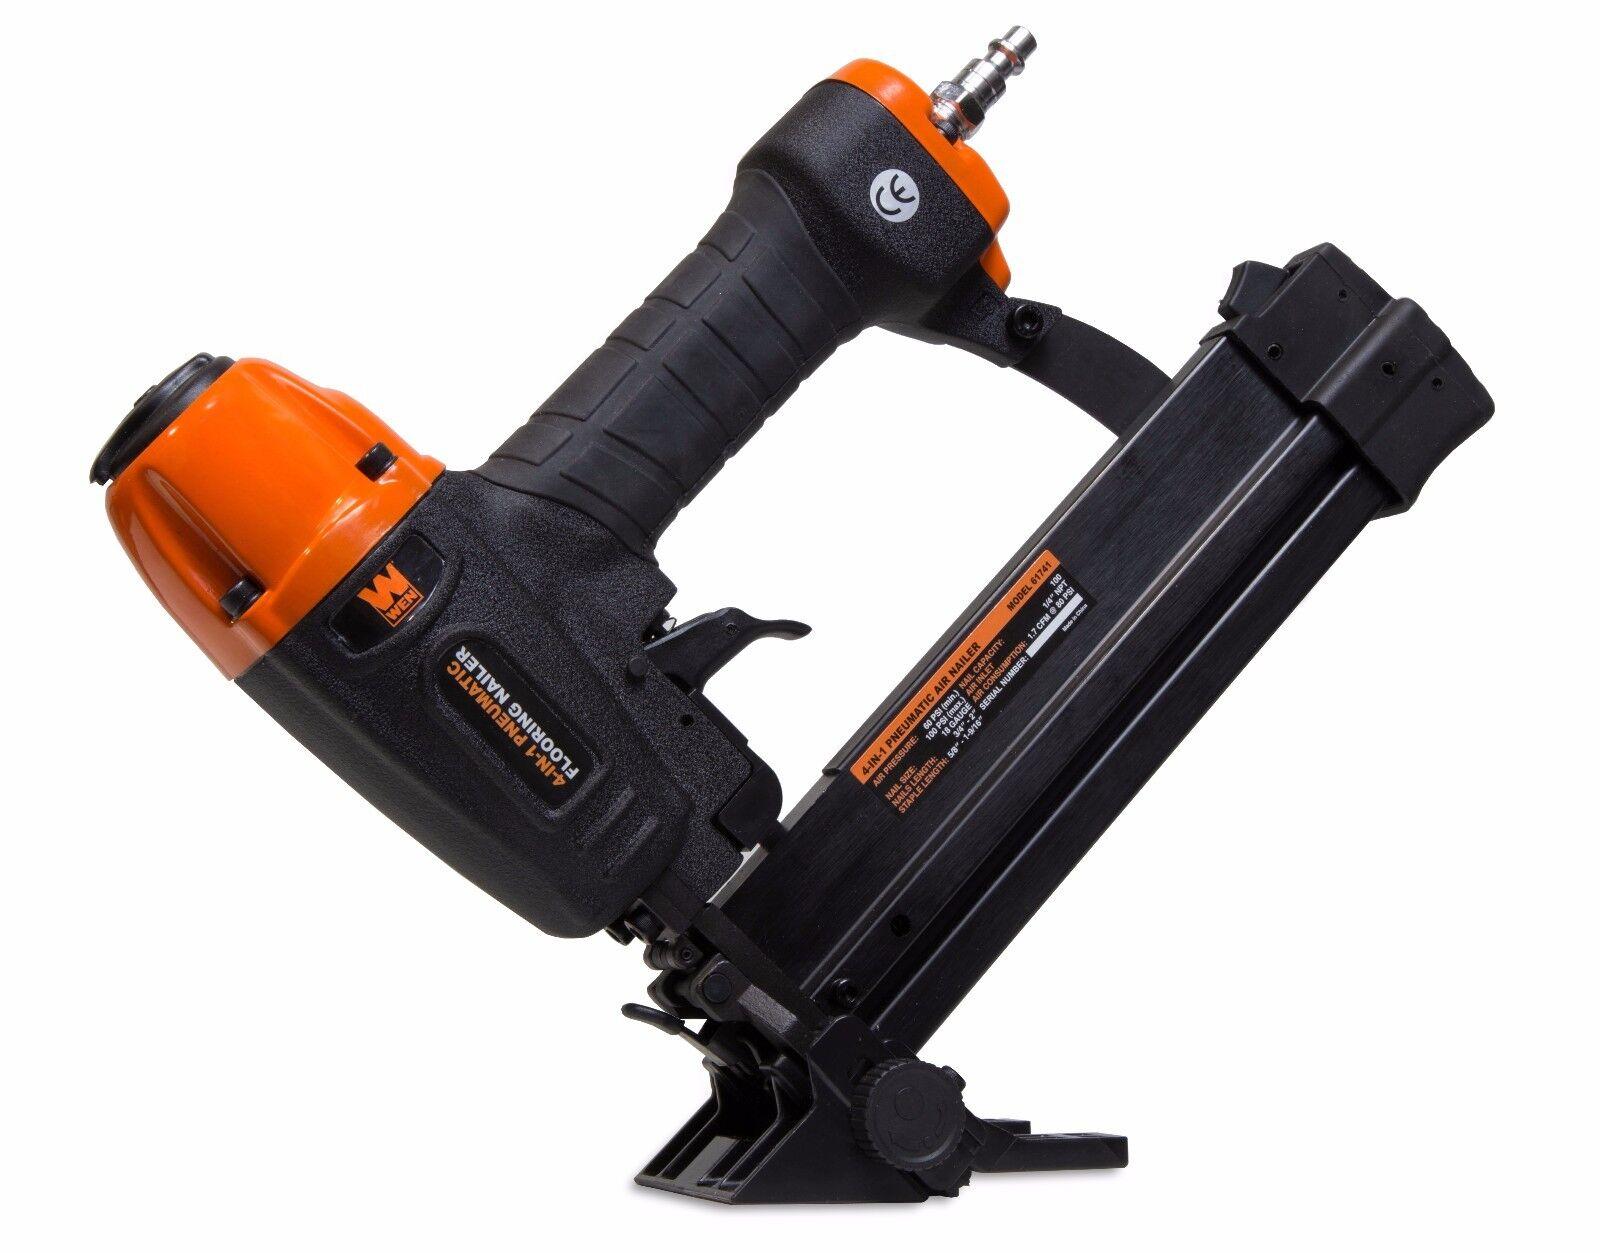 Air floor stapler 18 gauge taurus hexa striker battery